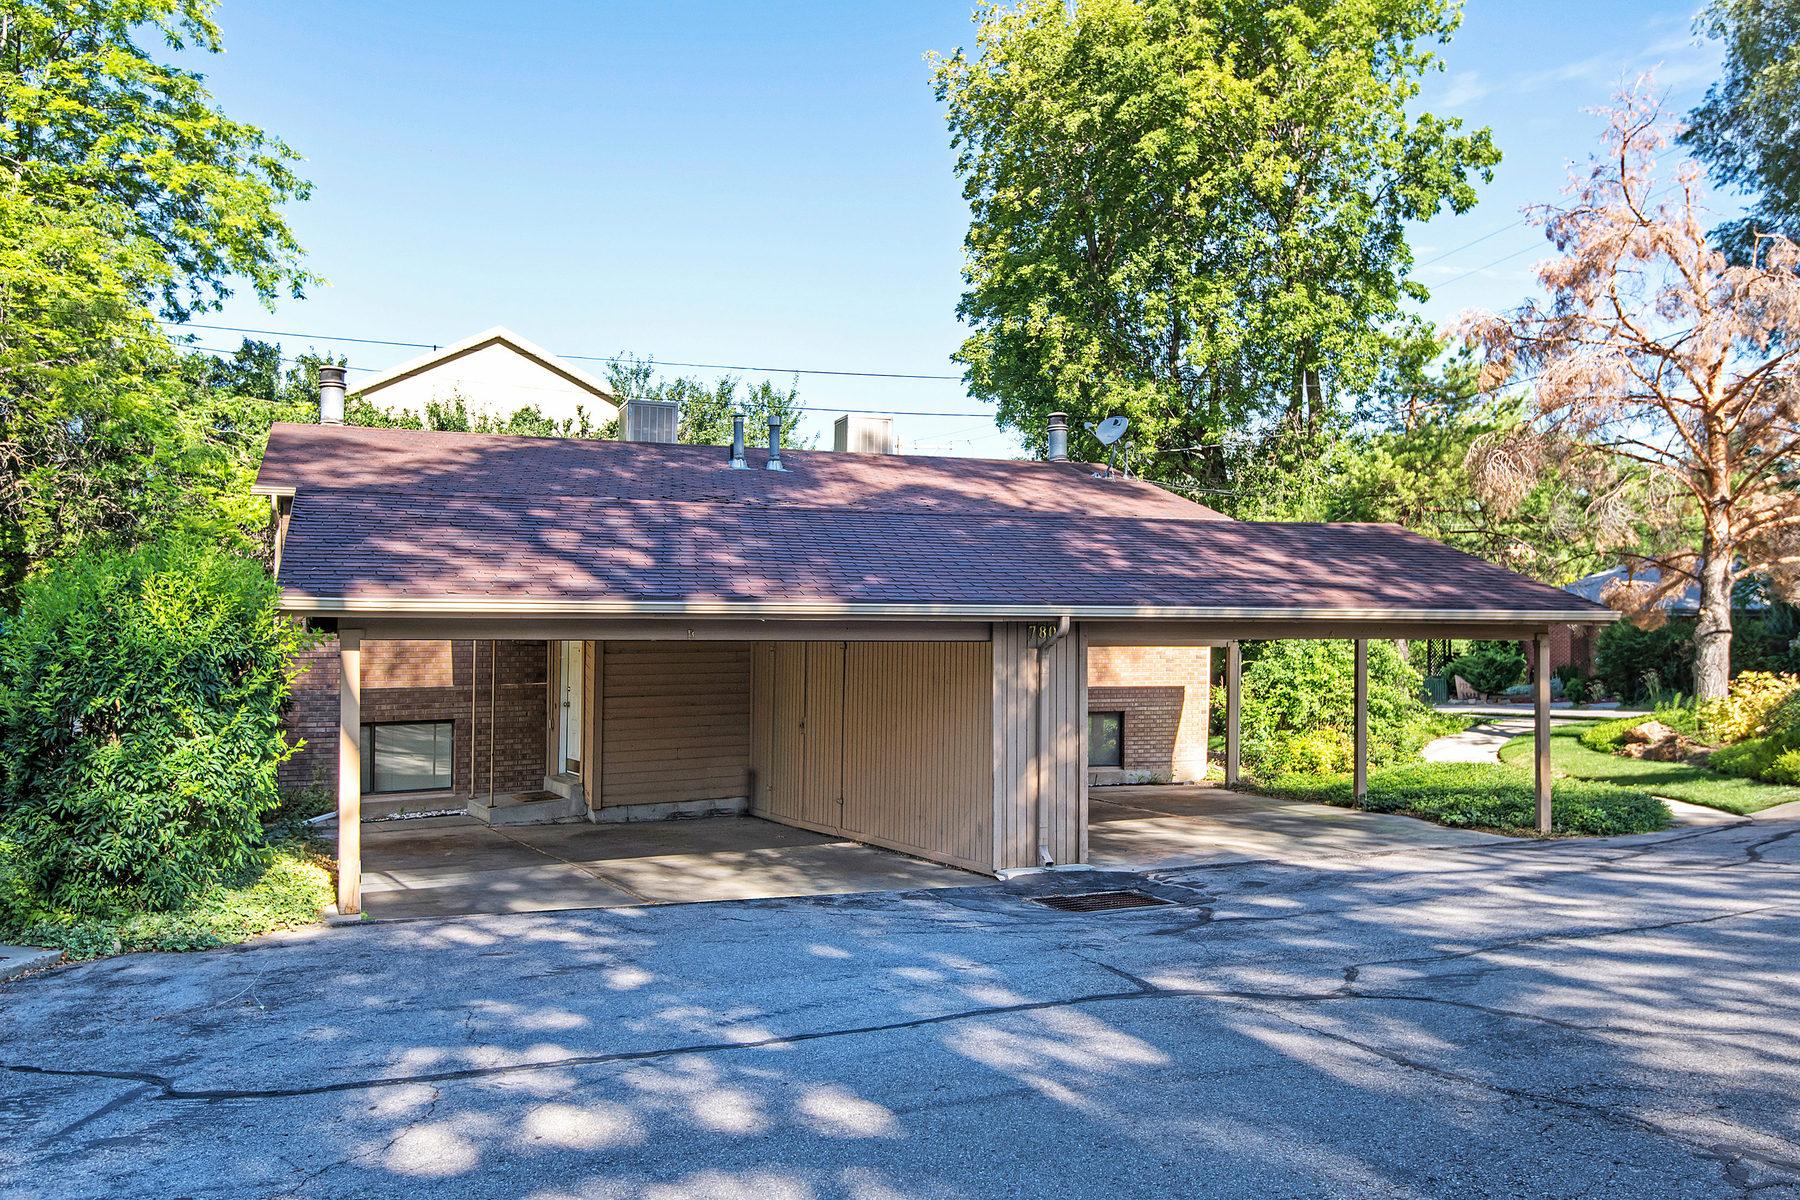 Condominium for Sale at Lovely Millcreek Condo 780 E Scott Ave #1B Salt Lake City, Utah 84106 United States